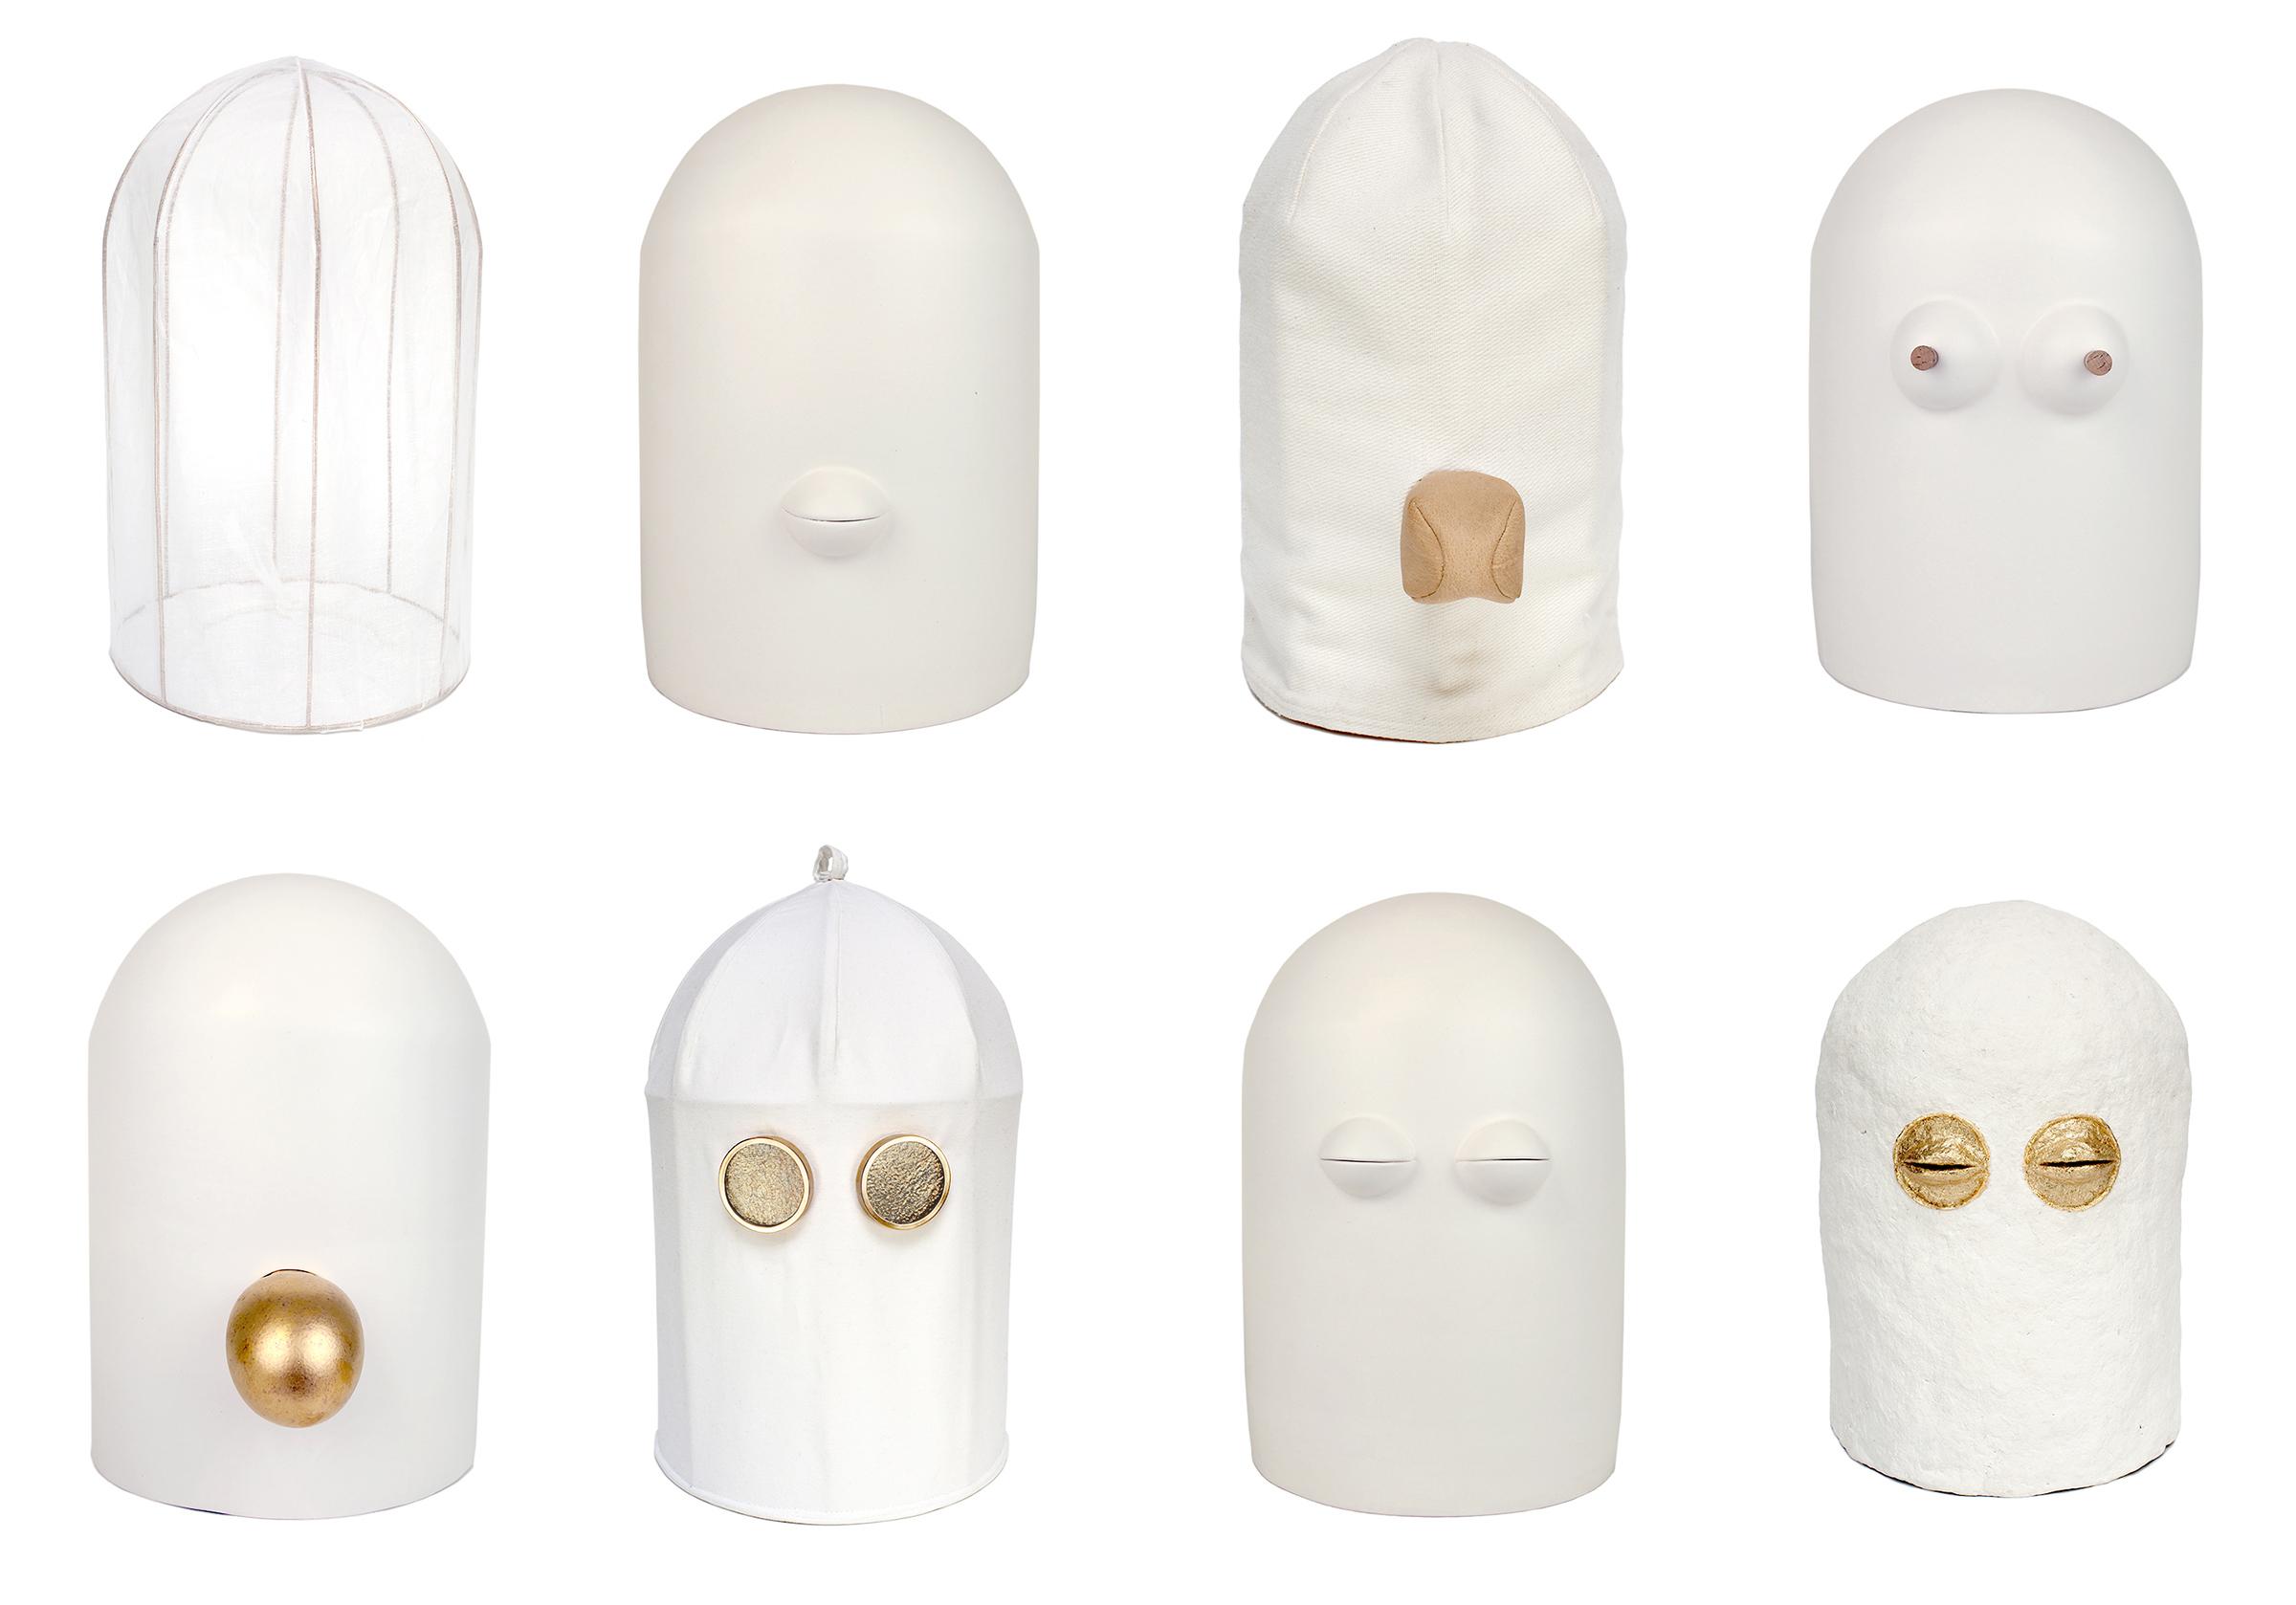 Lauren Kalman,  Avatars , 2015, Slip cast earthenware, gold-plated brass, paper mache, leather, glass, 14 x 10 x 10 in. each, Courtesy of Lauren Kalman, Photo: Lauren Kalman